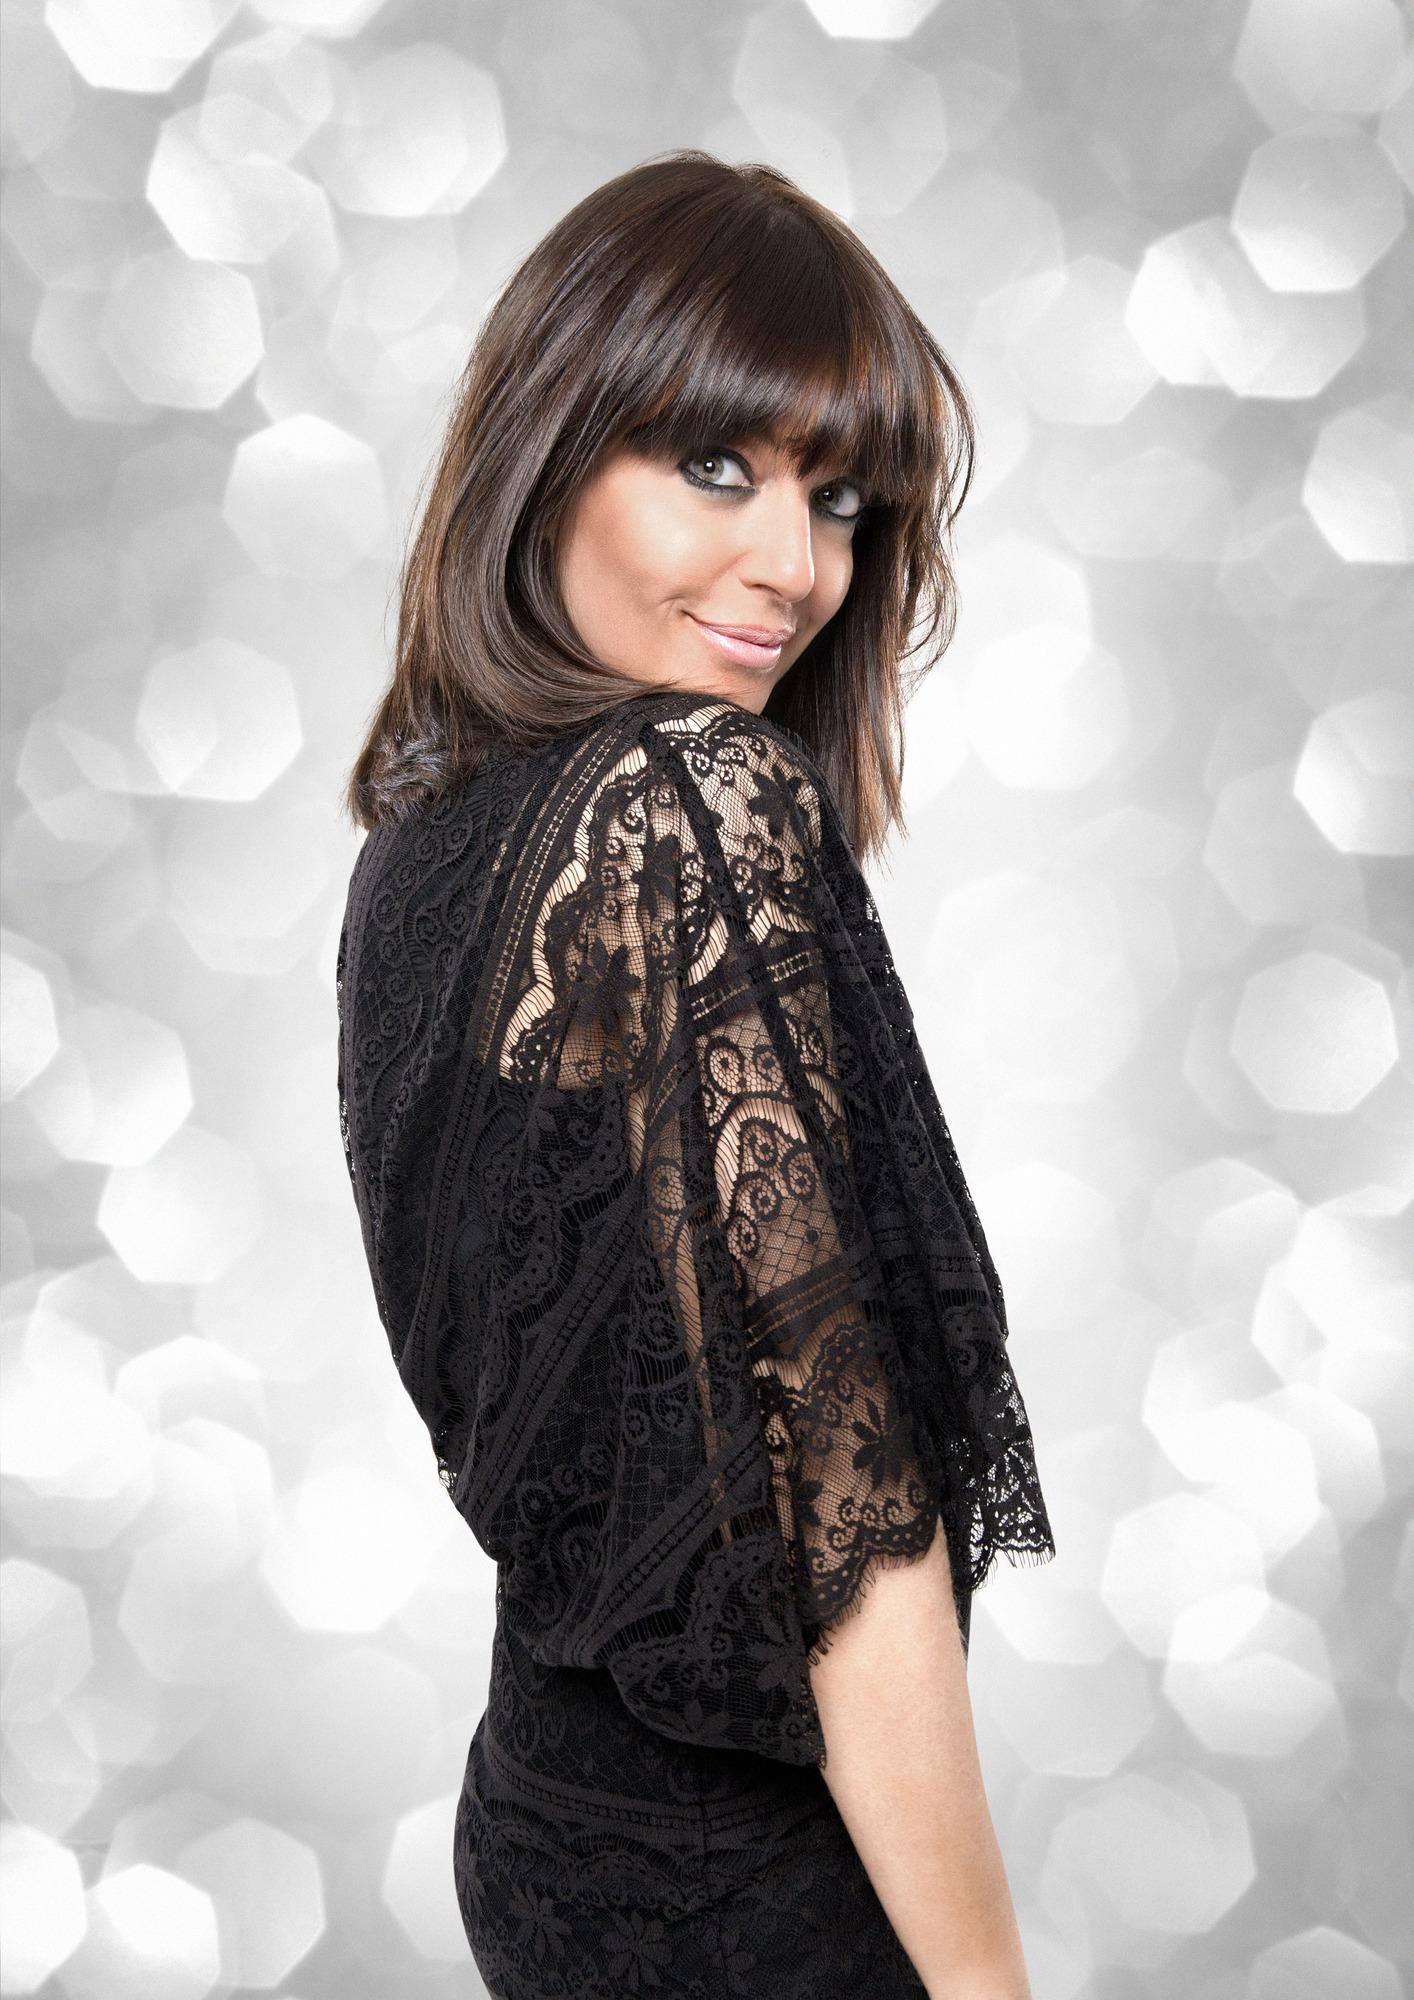 Claudia Winkleman - (C) BBC - Photographer: Ray Burmiston